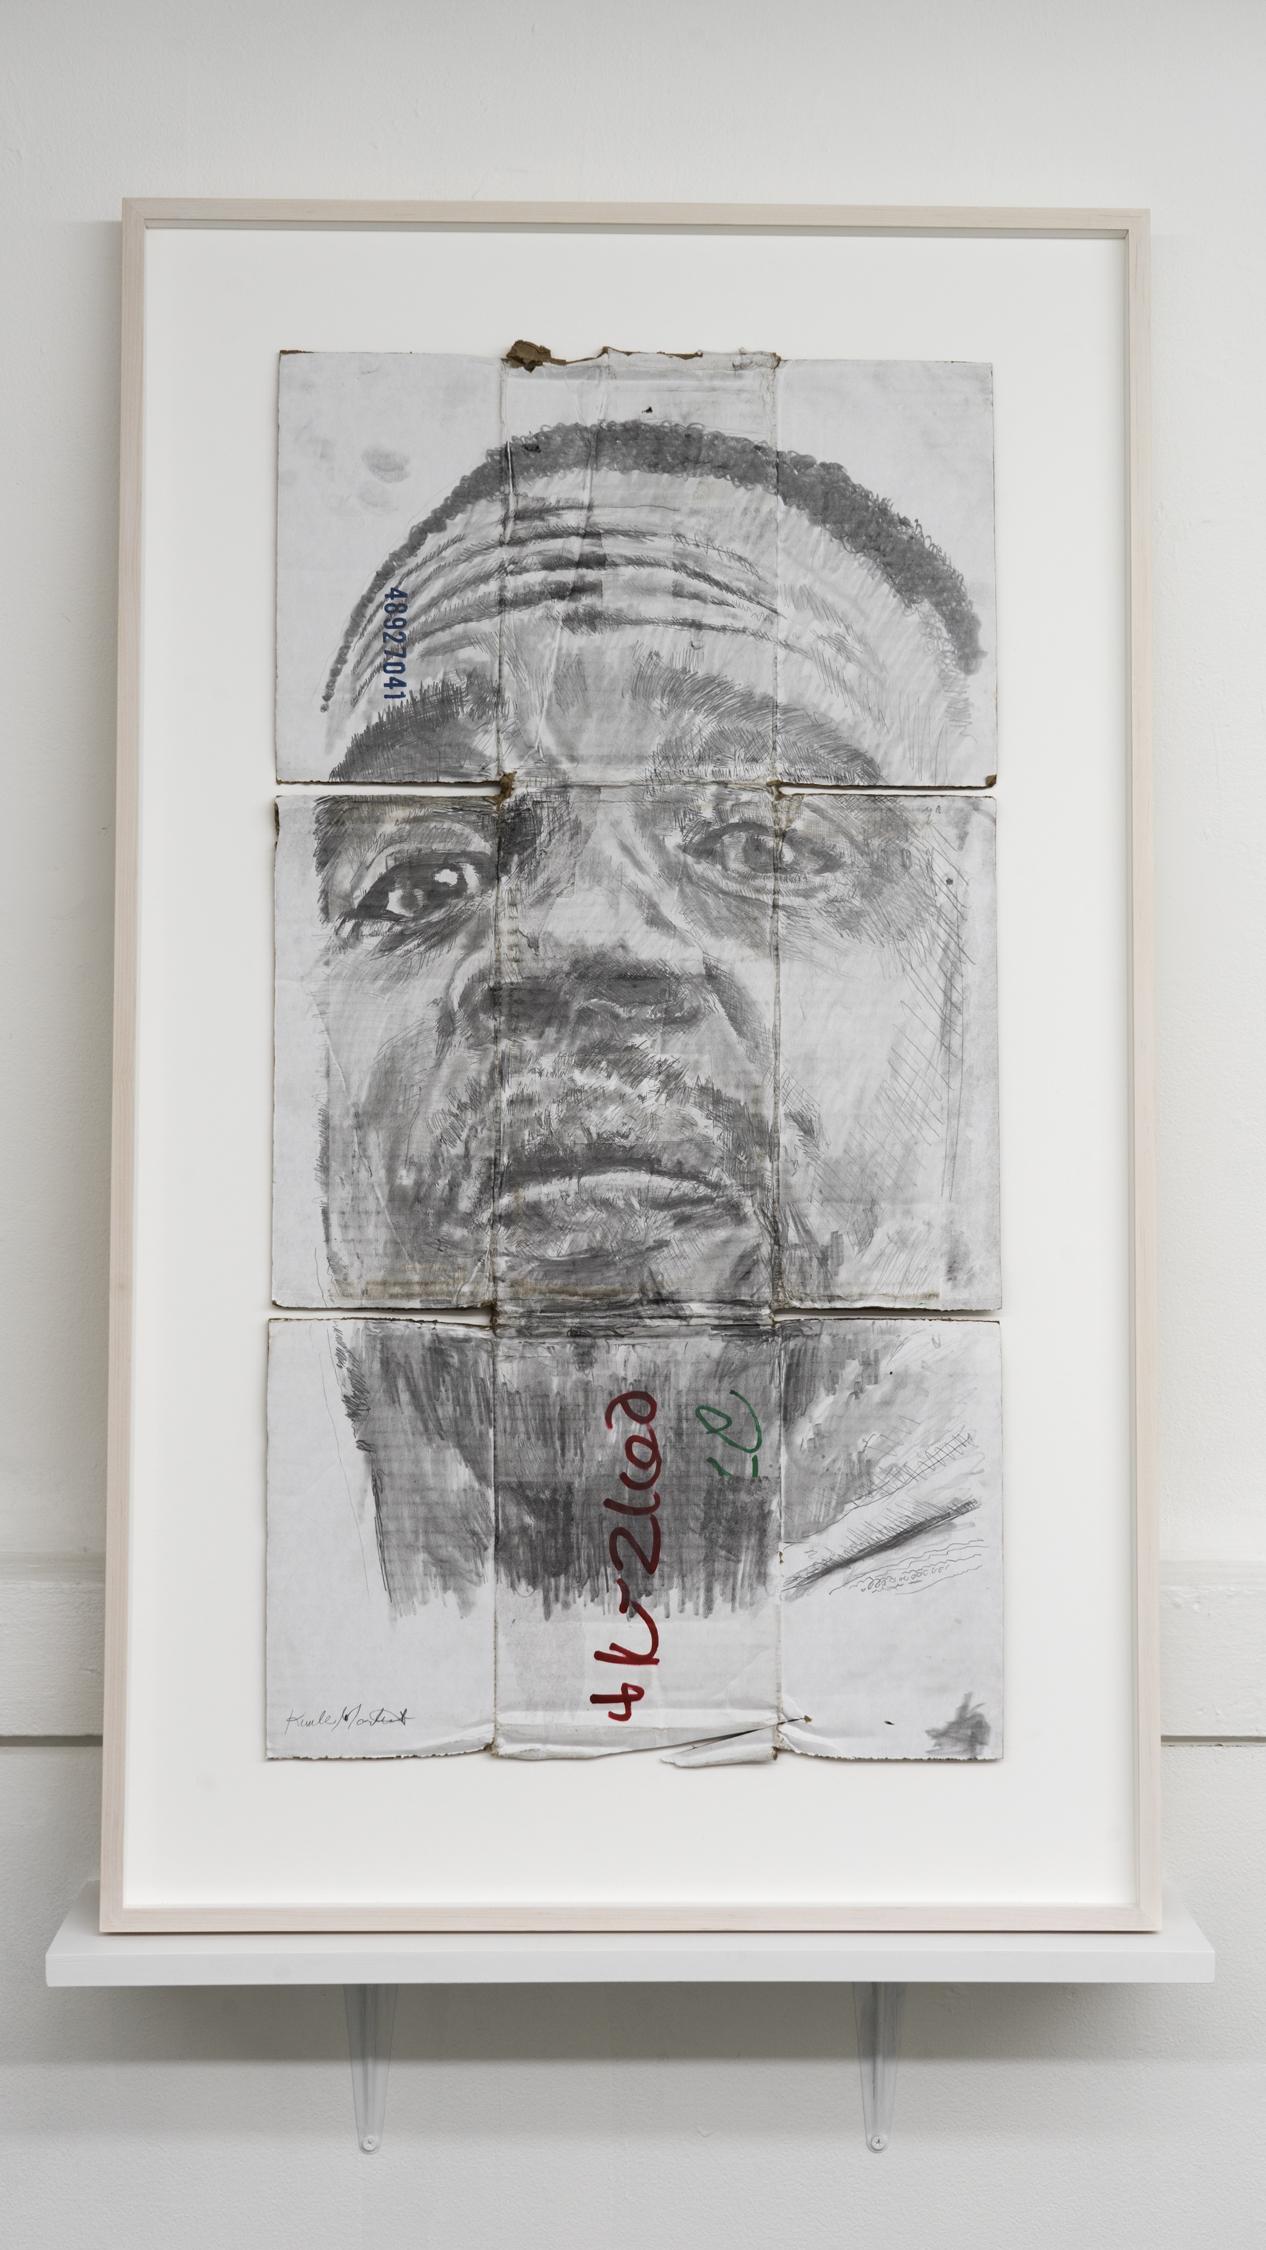 Kunle F. Martins,  Self Portrait,  2019, pencil on found white cardboard box, 29 × 23 ½ inches